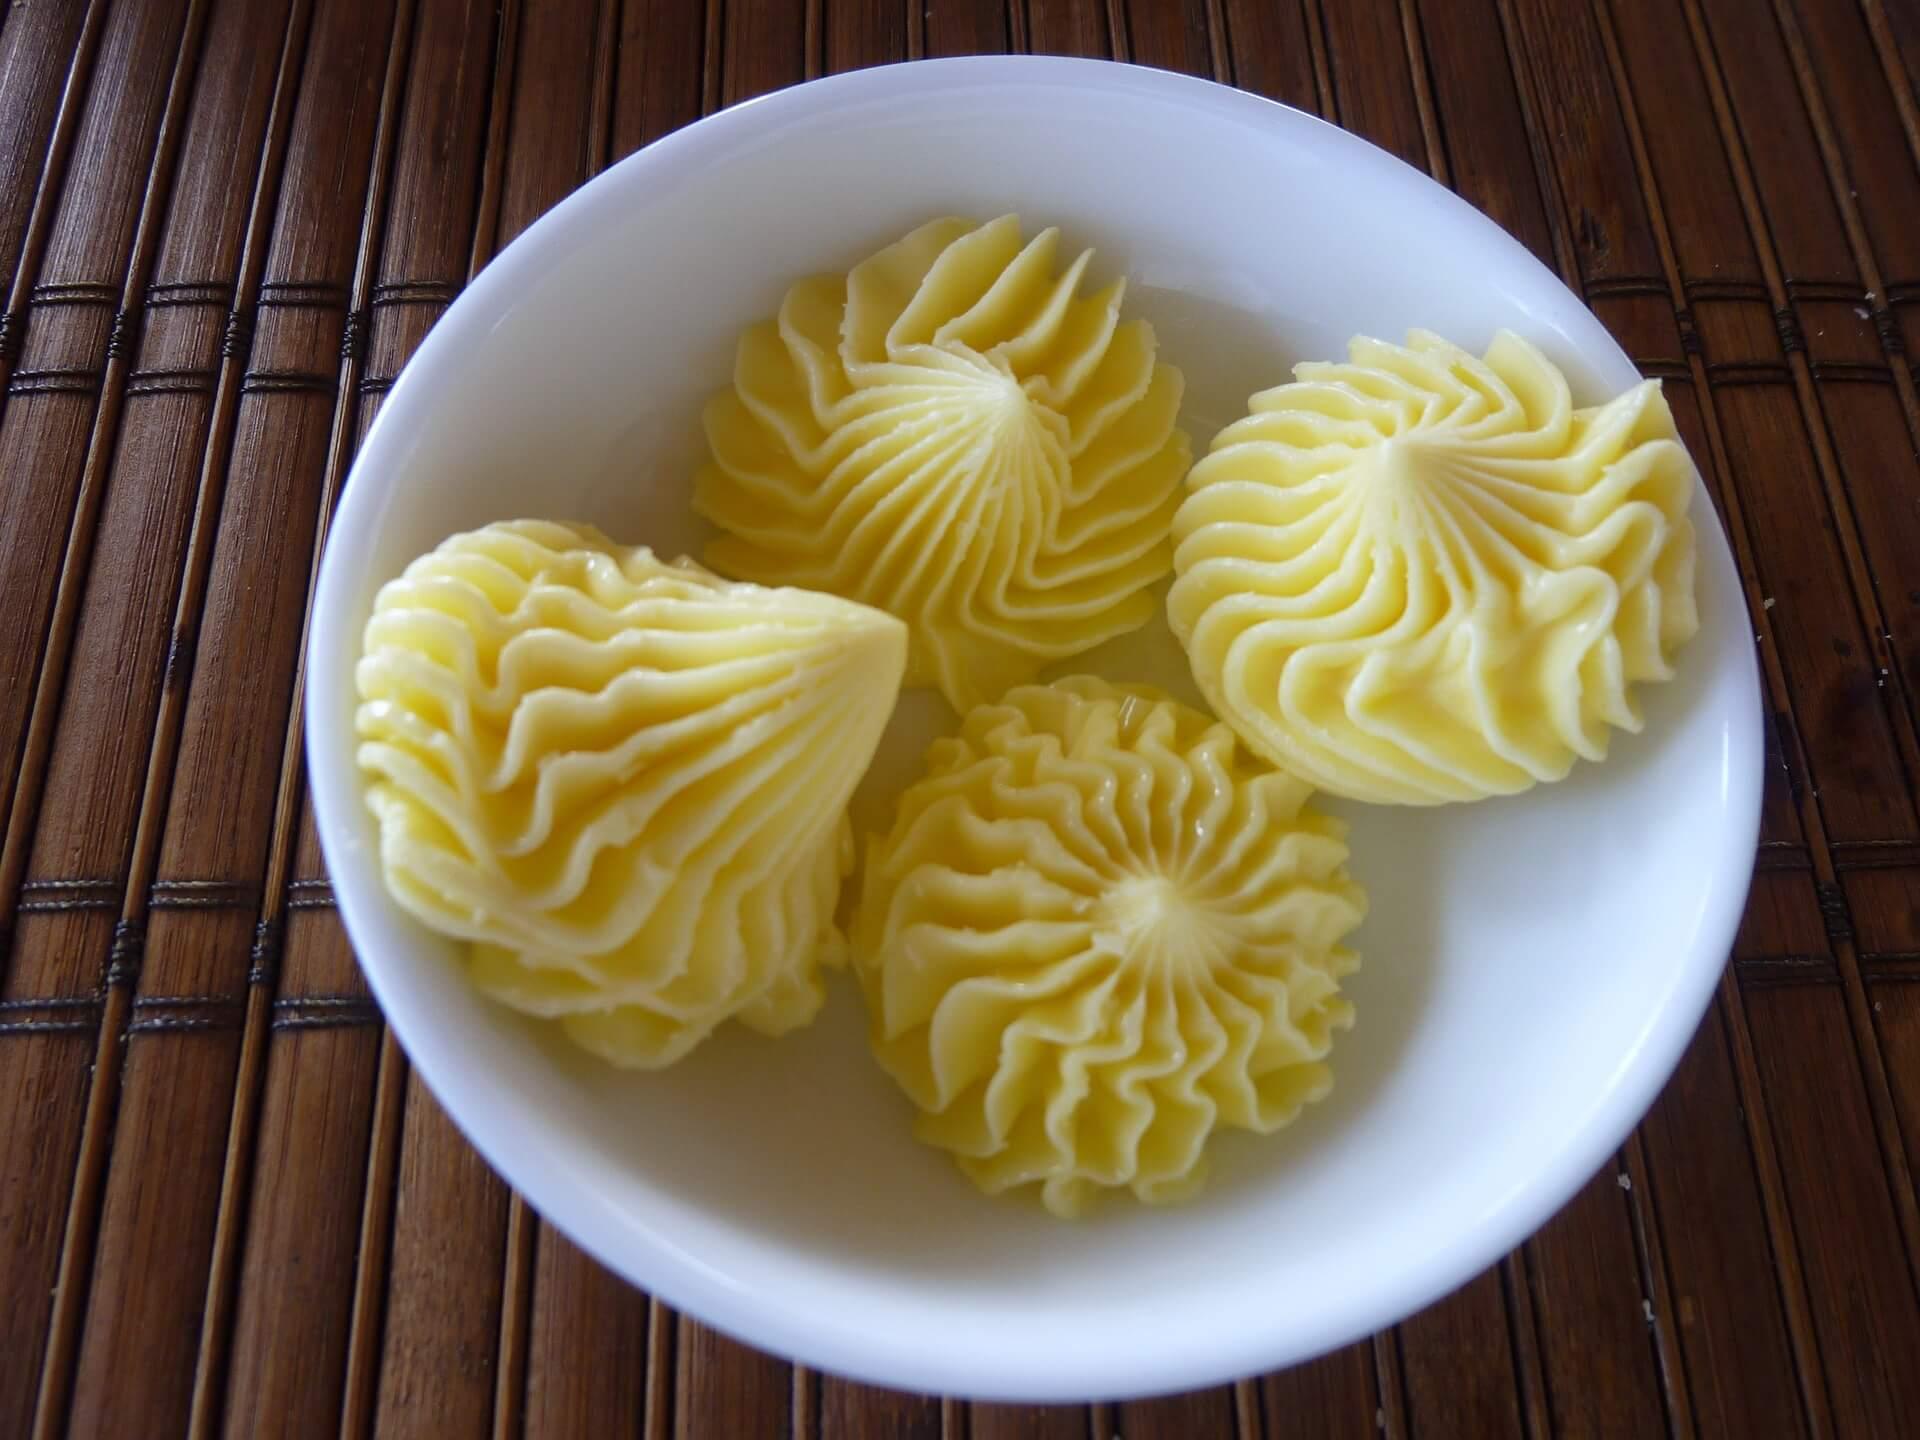 máslo nebo margarín